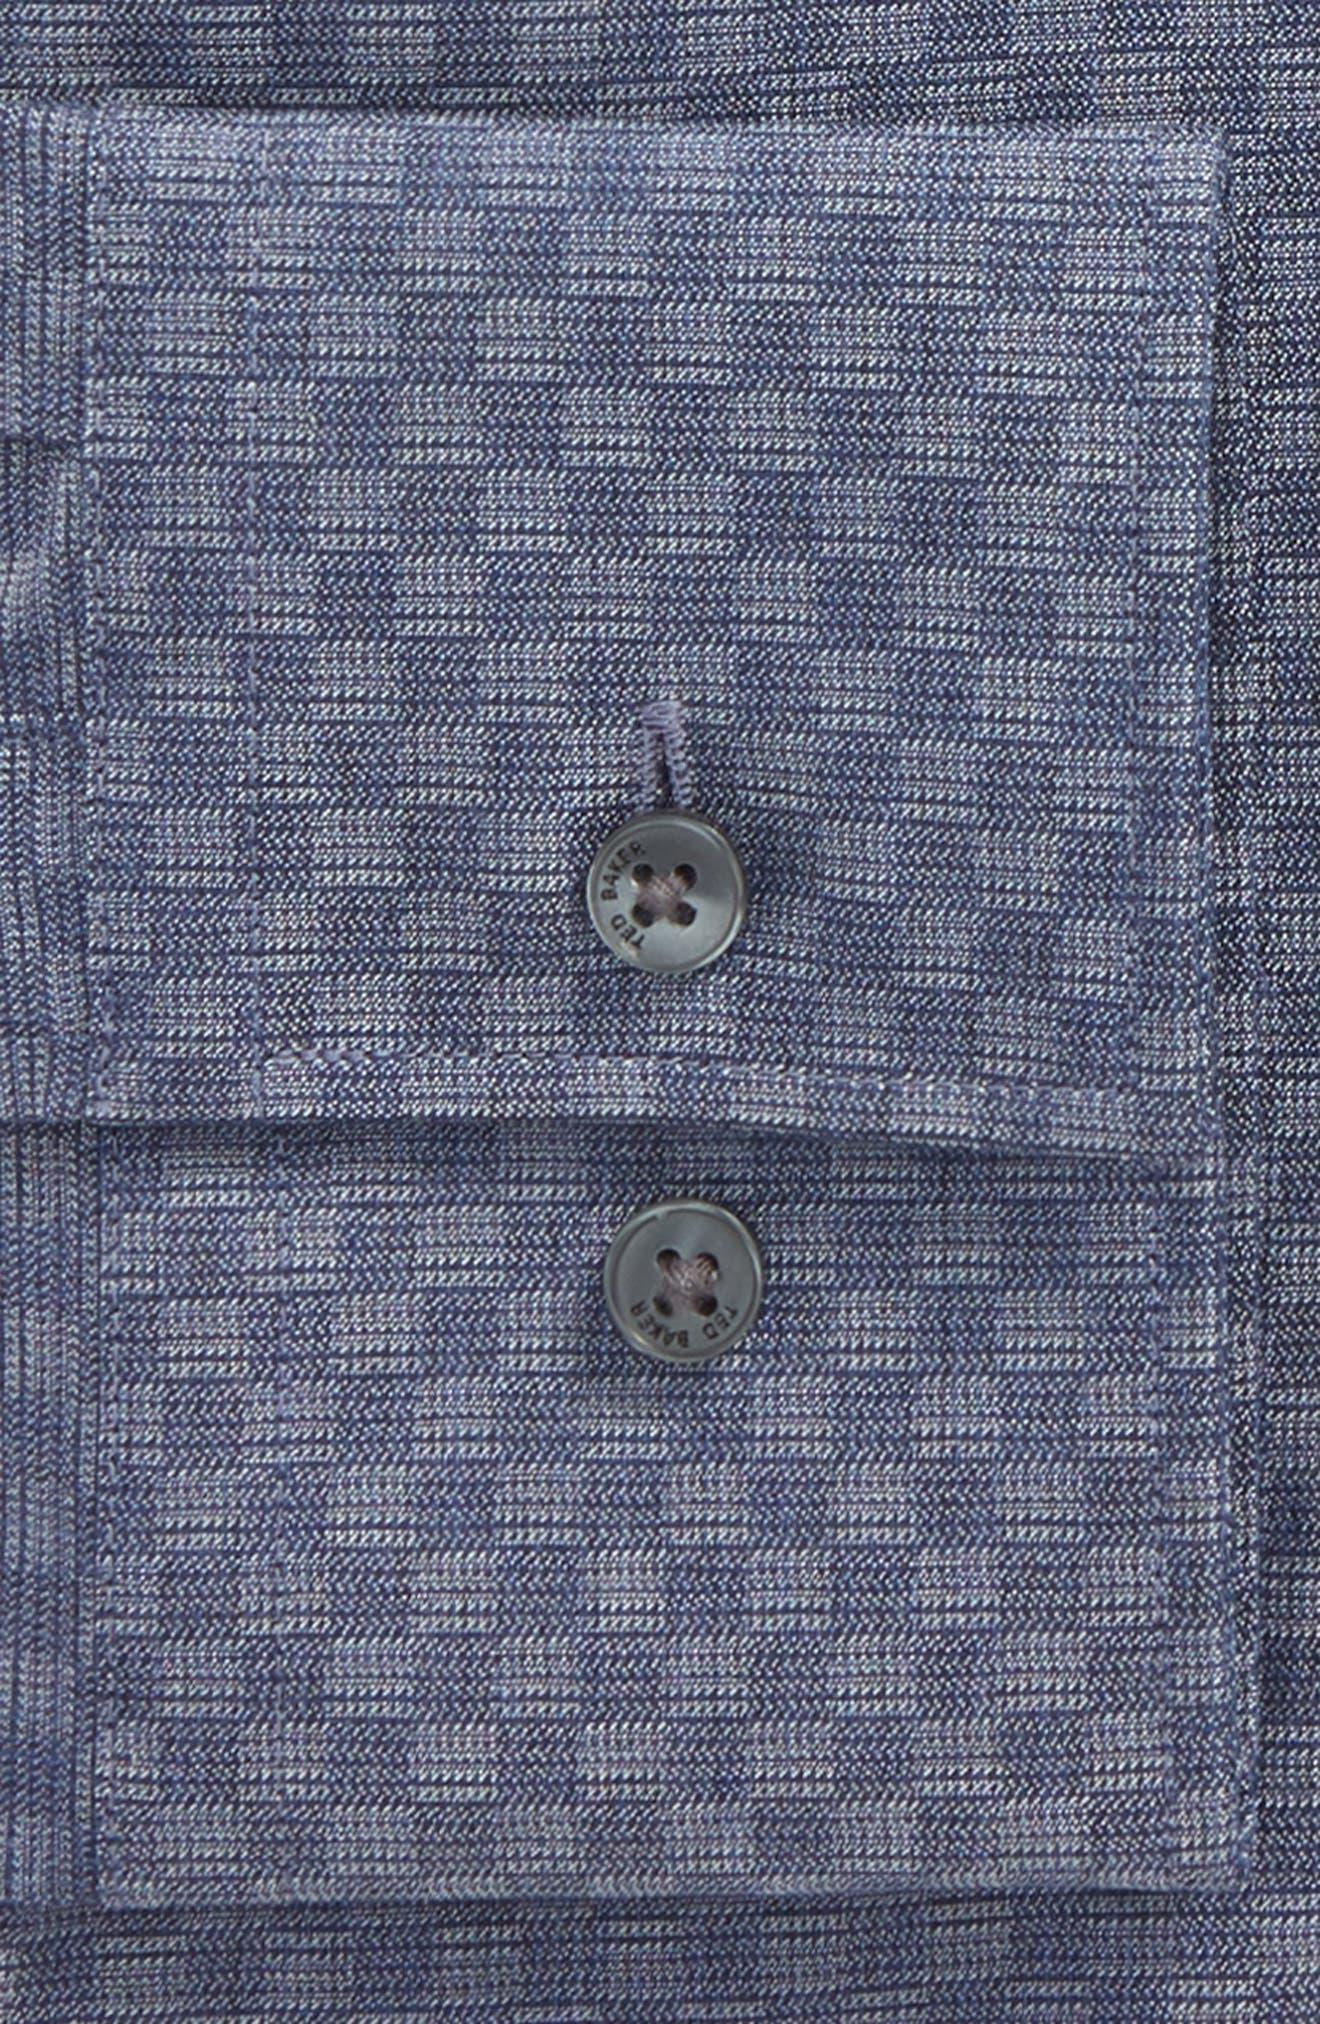 Wests Slim Fit Check Dress Shirt,                             Alternate thumbnail 2, color,                             410